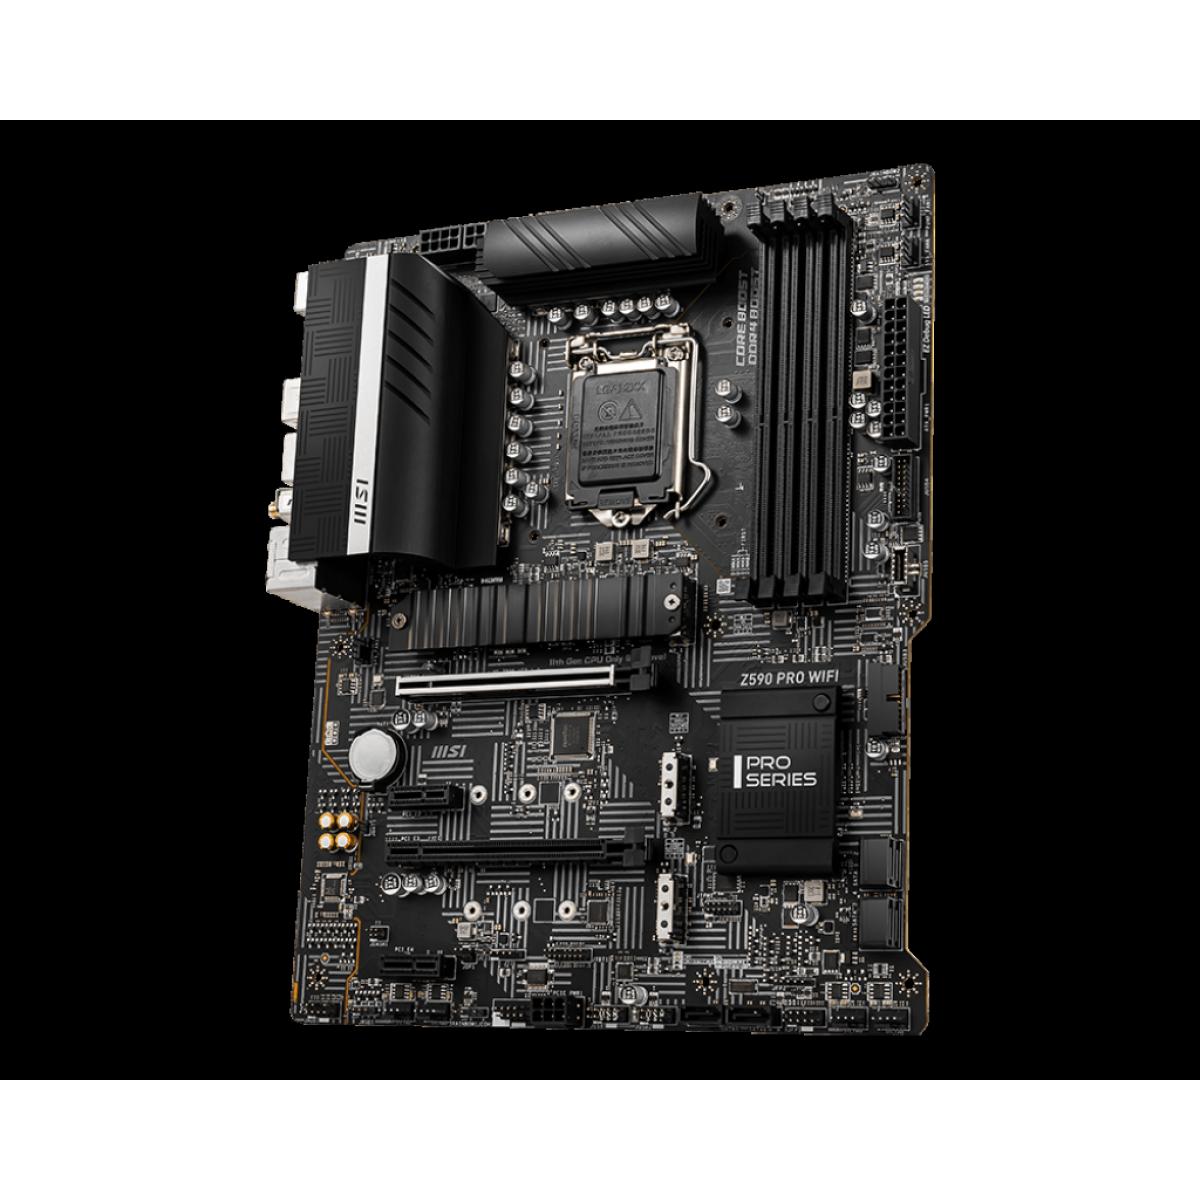 Placa Mãe MSI Z590 PRO WIFI, Intel Z590 Chipset, Socket 1200, ATX, DDR4